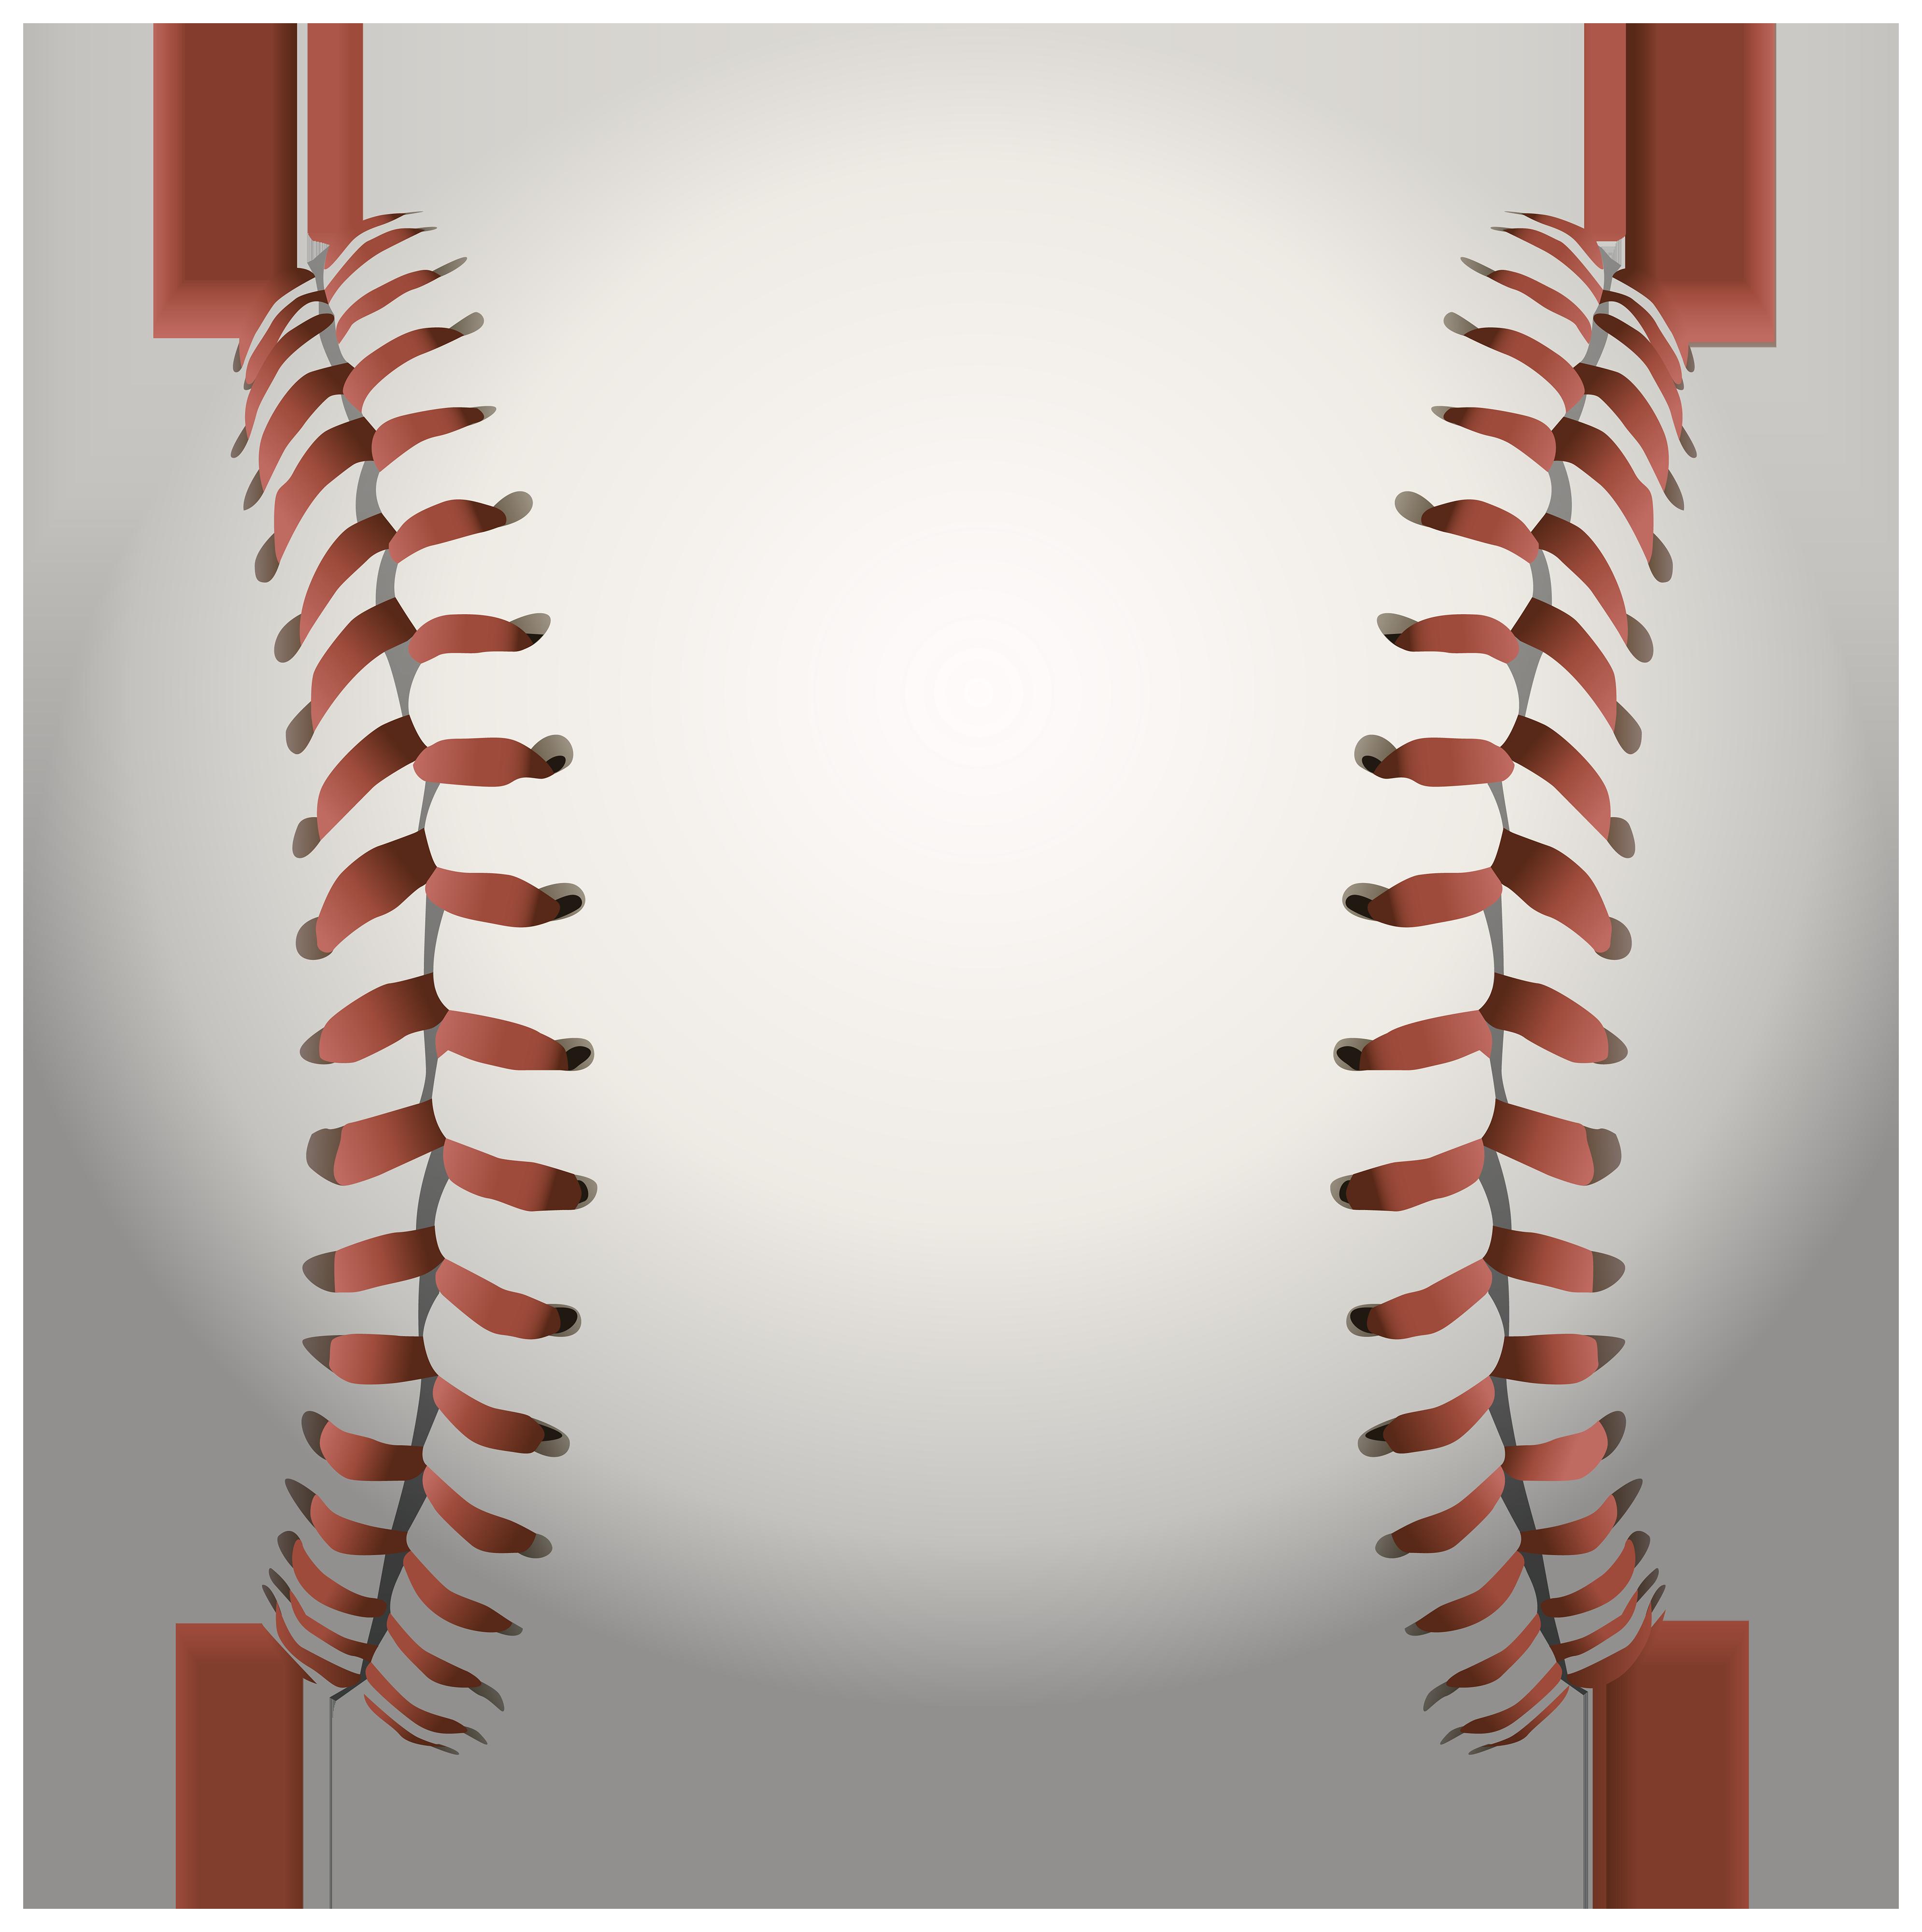 Ball png best web. Clipart hearts baseball